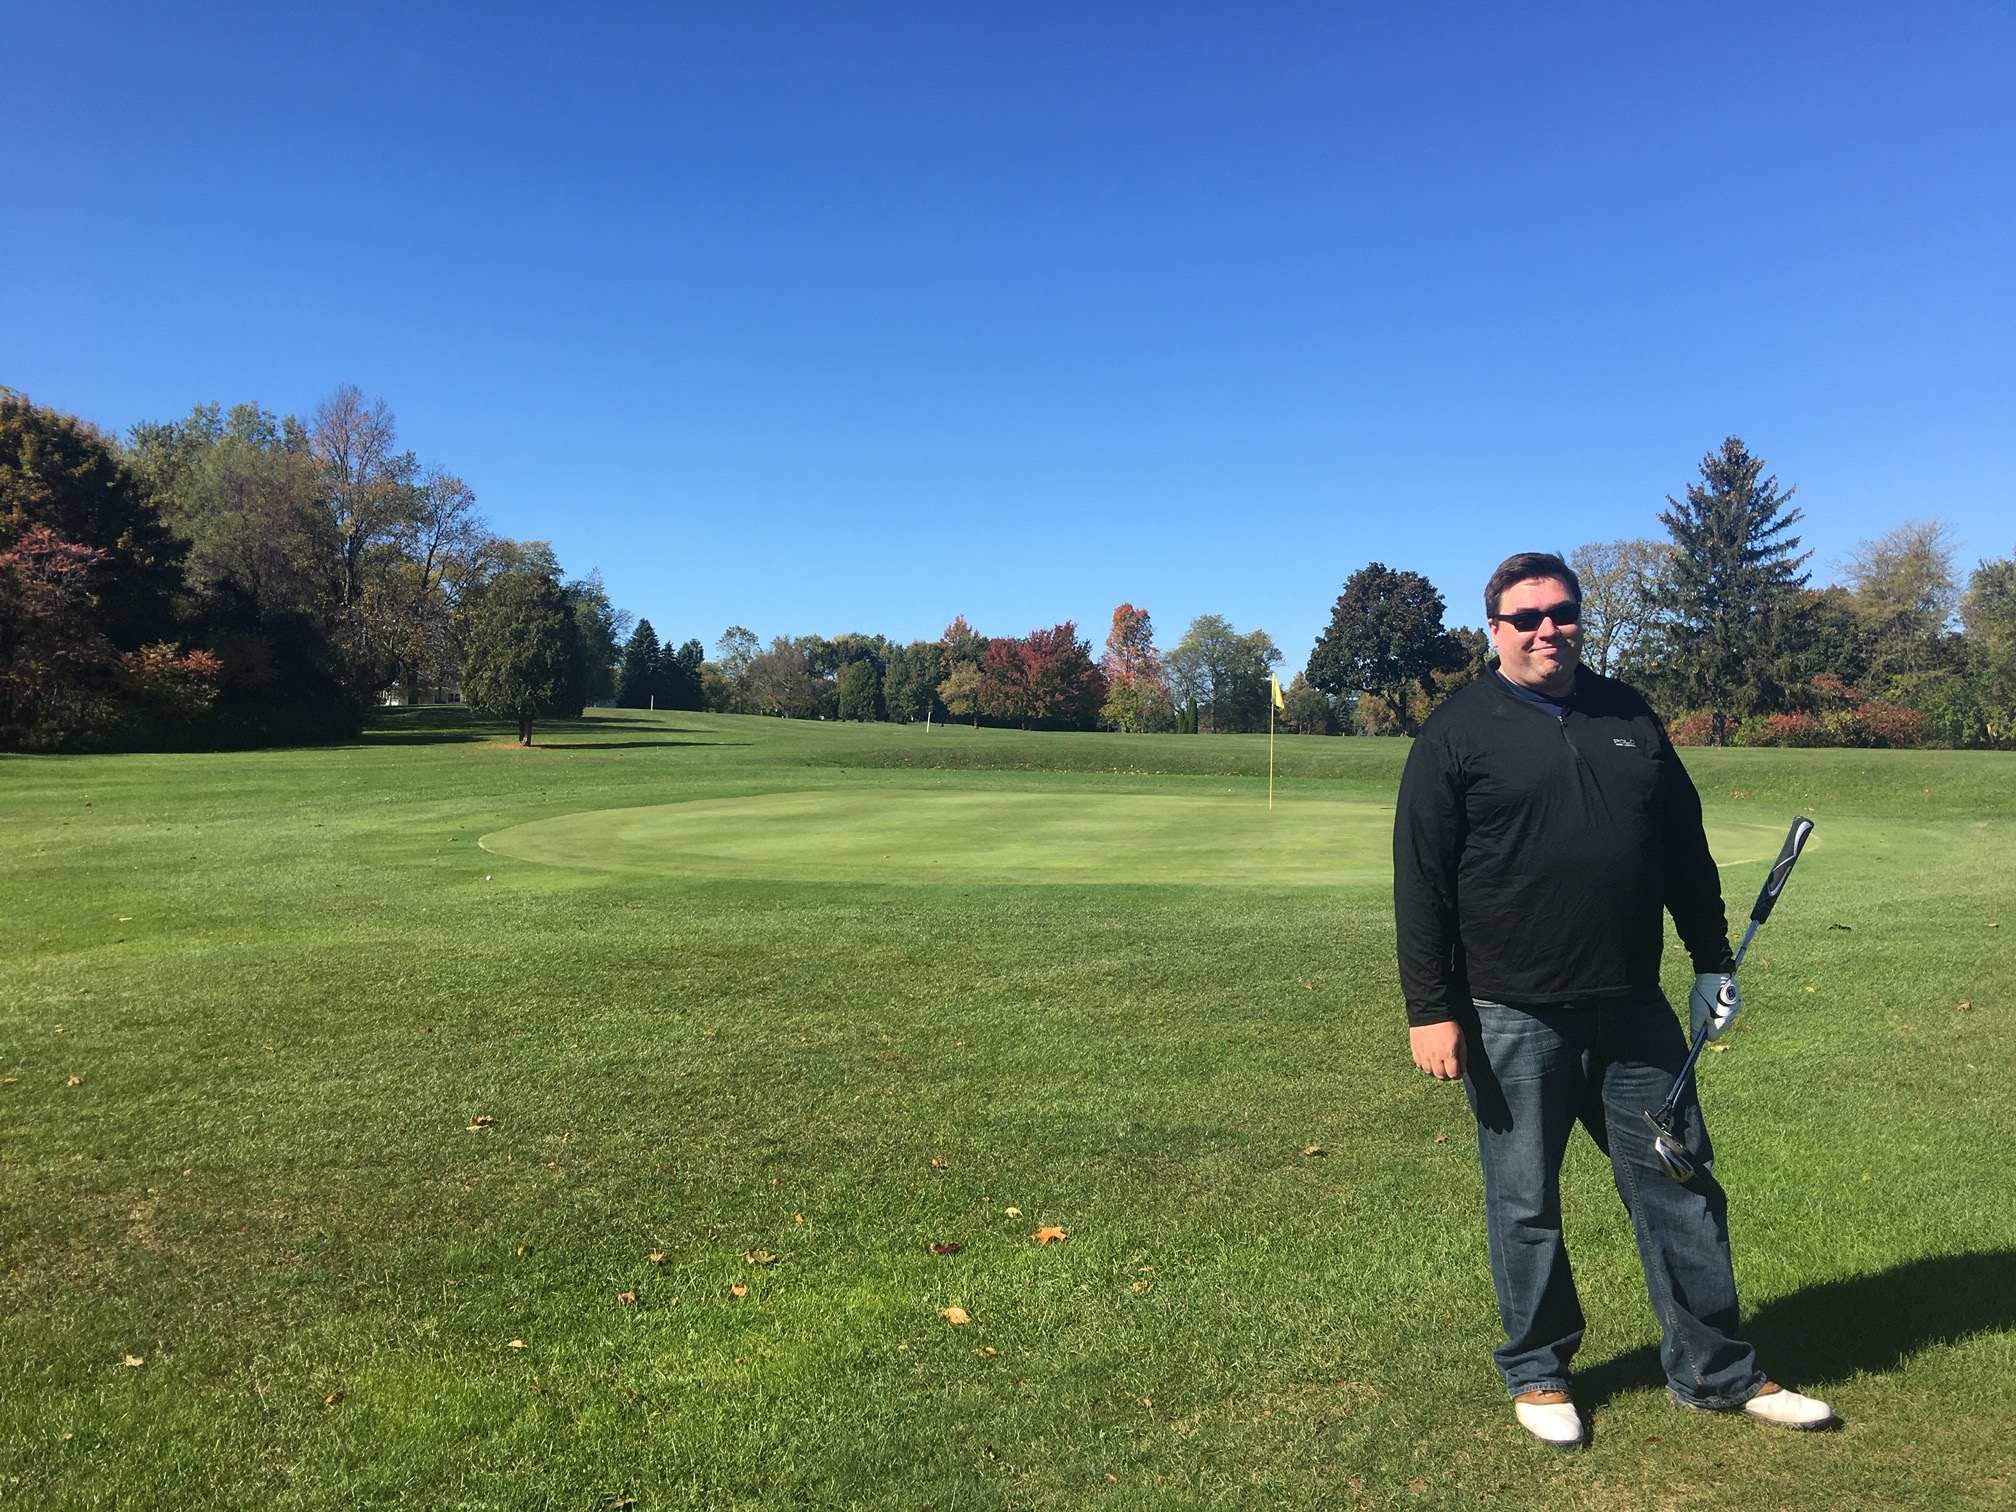 Greg & John playing golf, October, 2019, Lyndon, NY